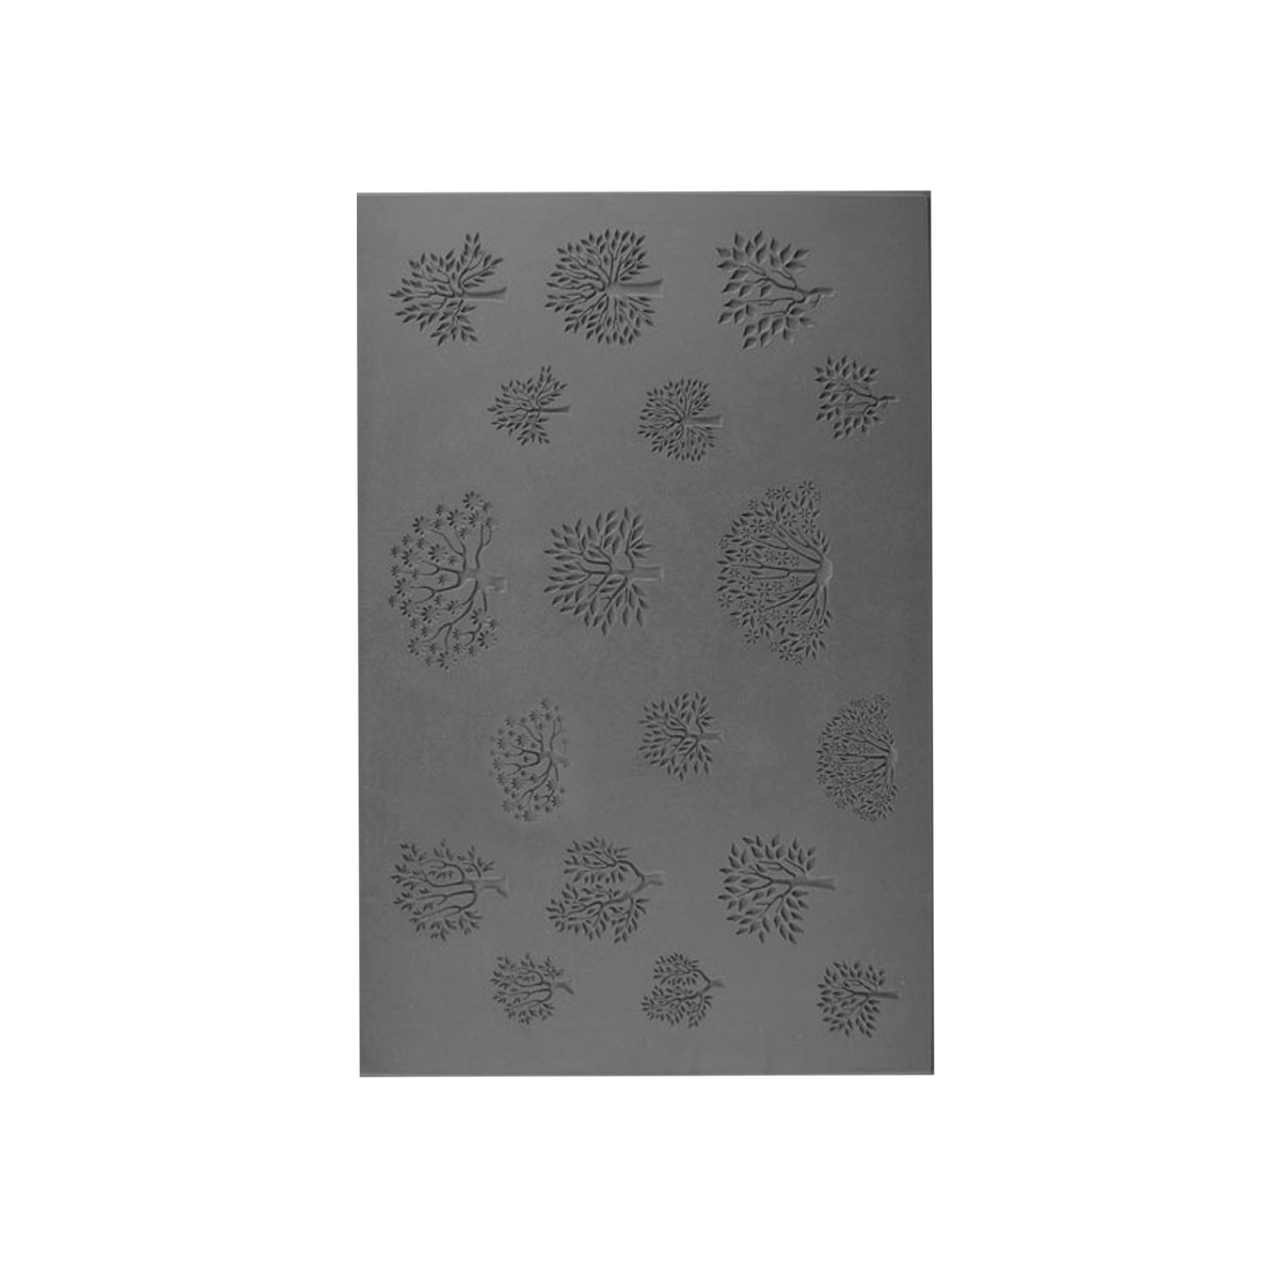 Jewellery Artist Elements Texture Sheet - Tree of Life 2